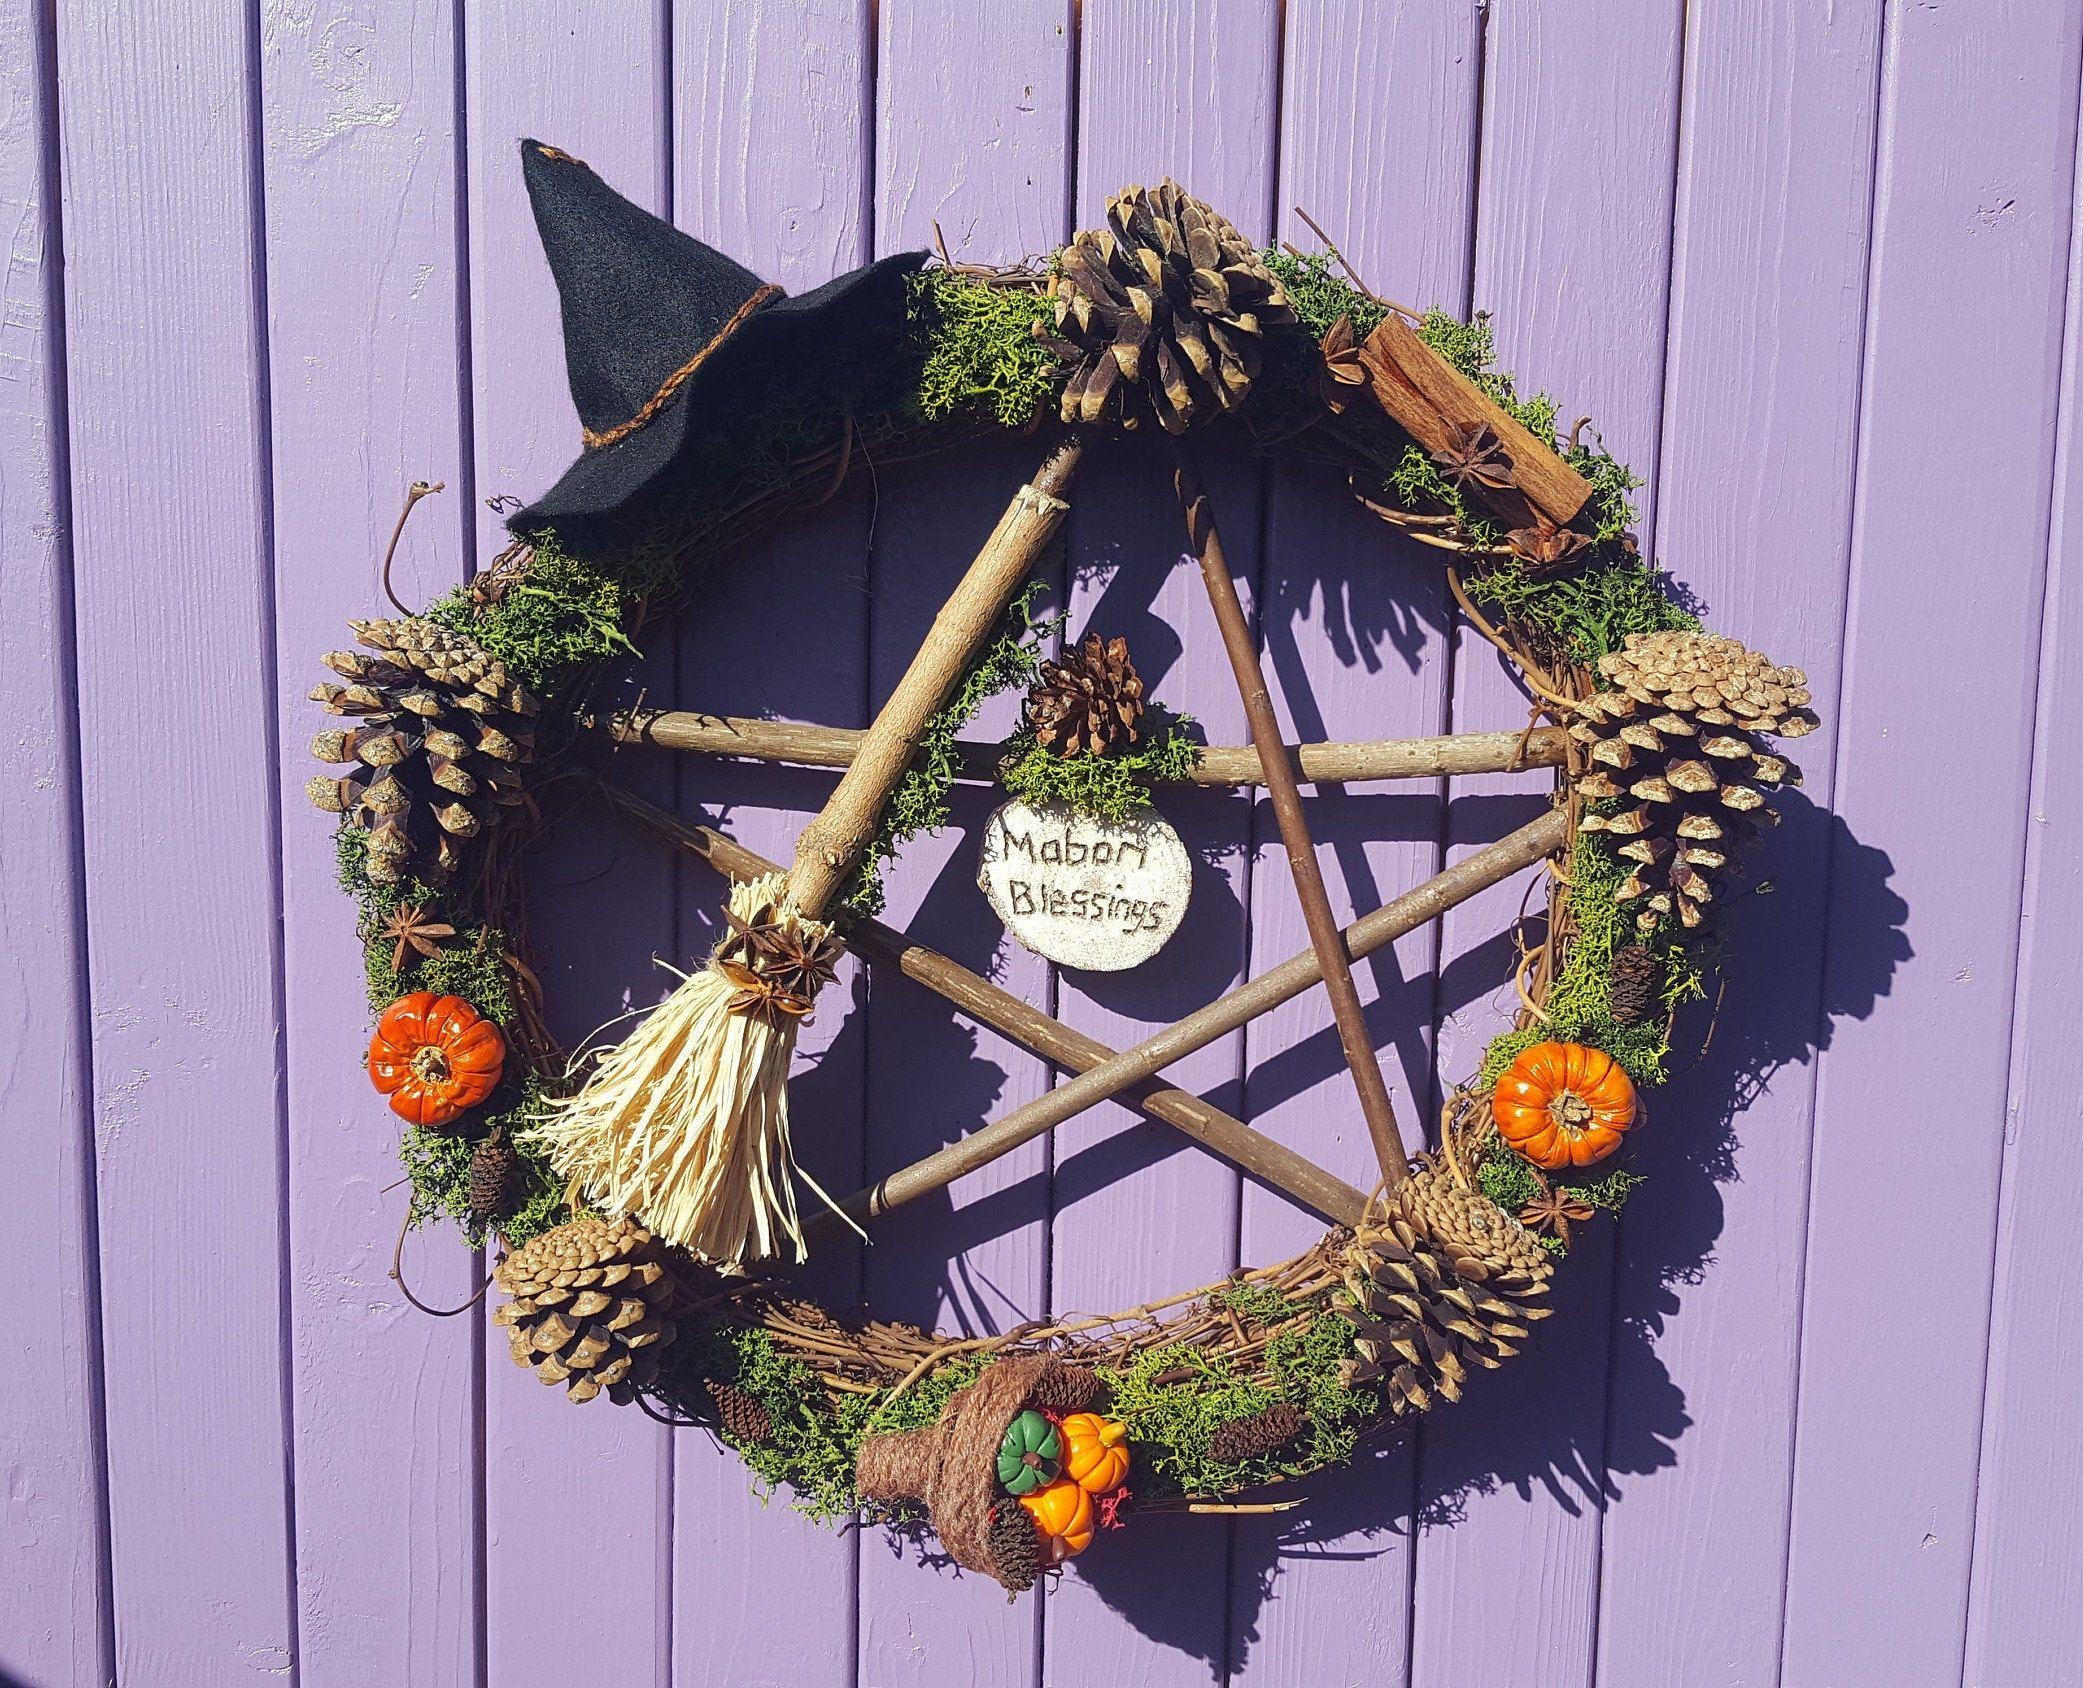 Autumn Wreath, Mabon Pentagram, Wooden Pentacle, Cinnamon Sticks, Black Witch Felt Hat, Witches Broomstick, Autumnal Equinox, Pine Cone